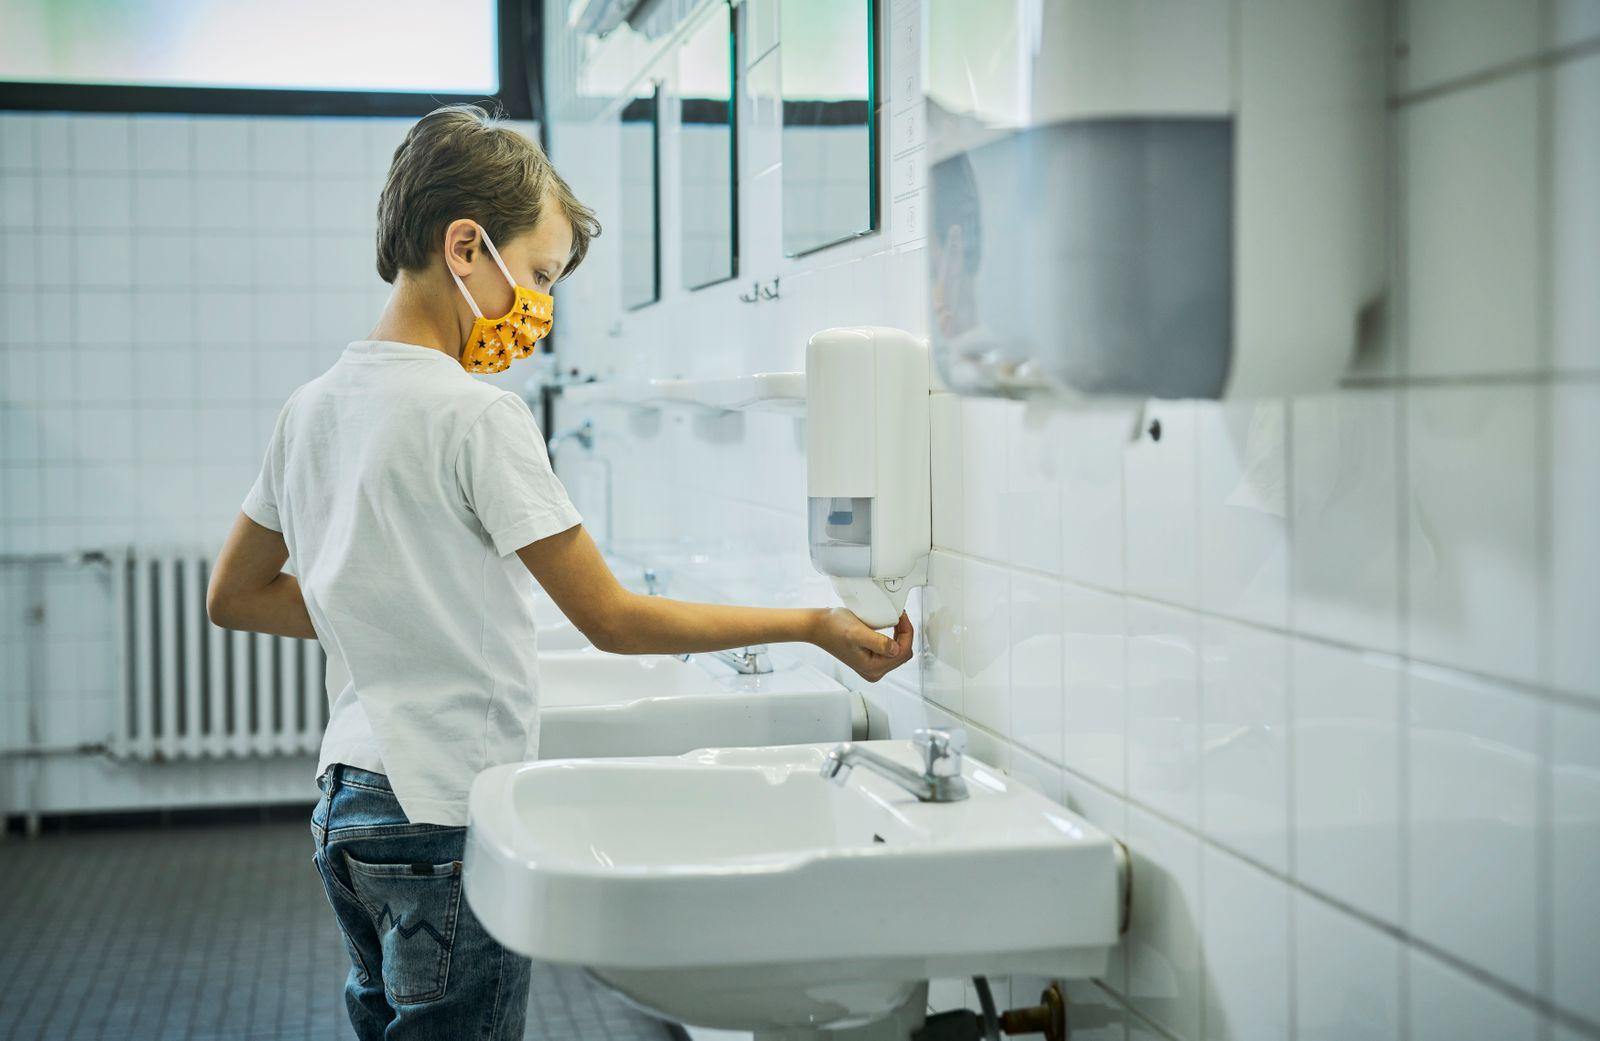 Boy wearing mask on school toilet washing his hands